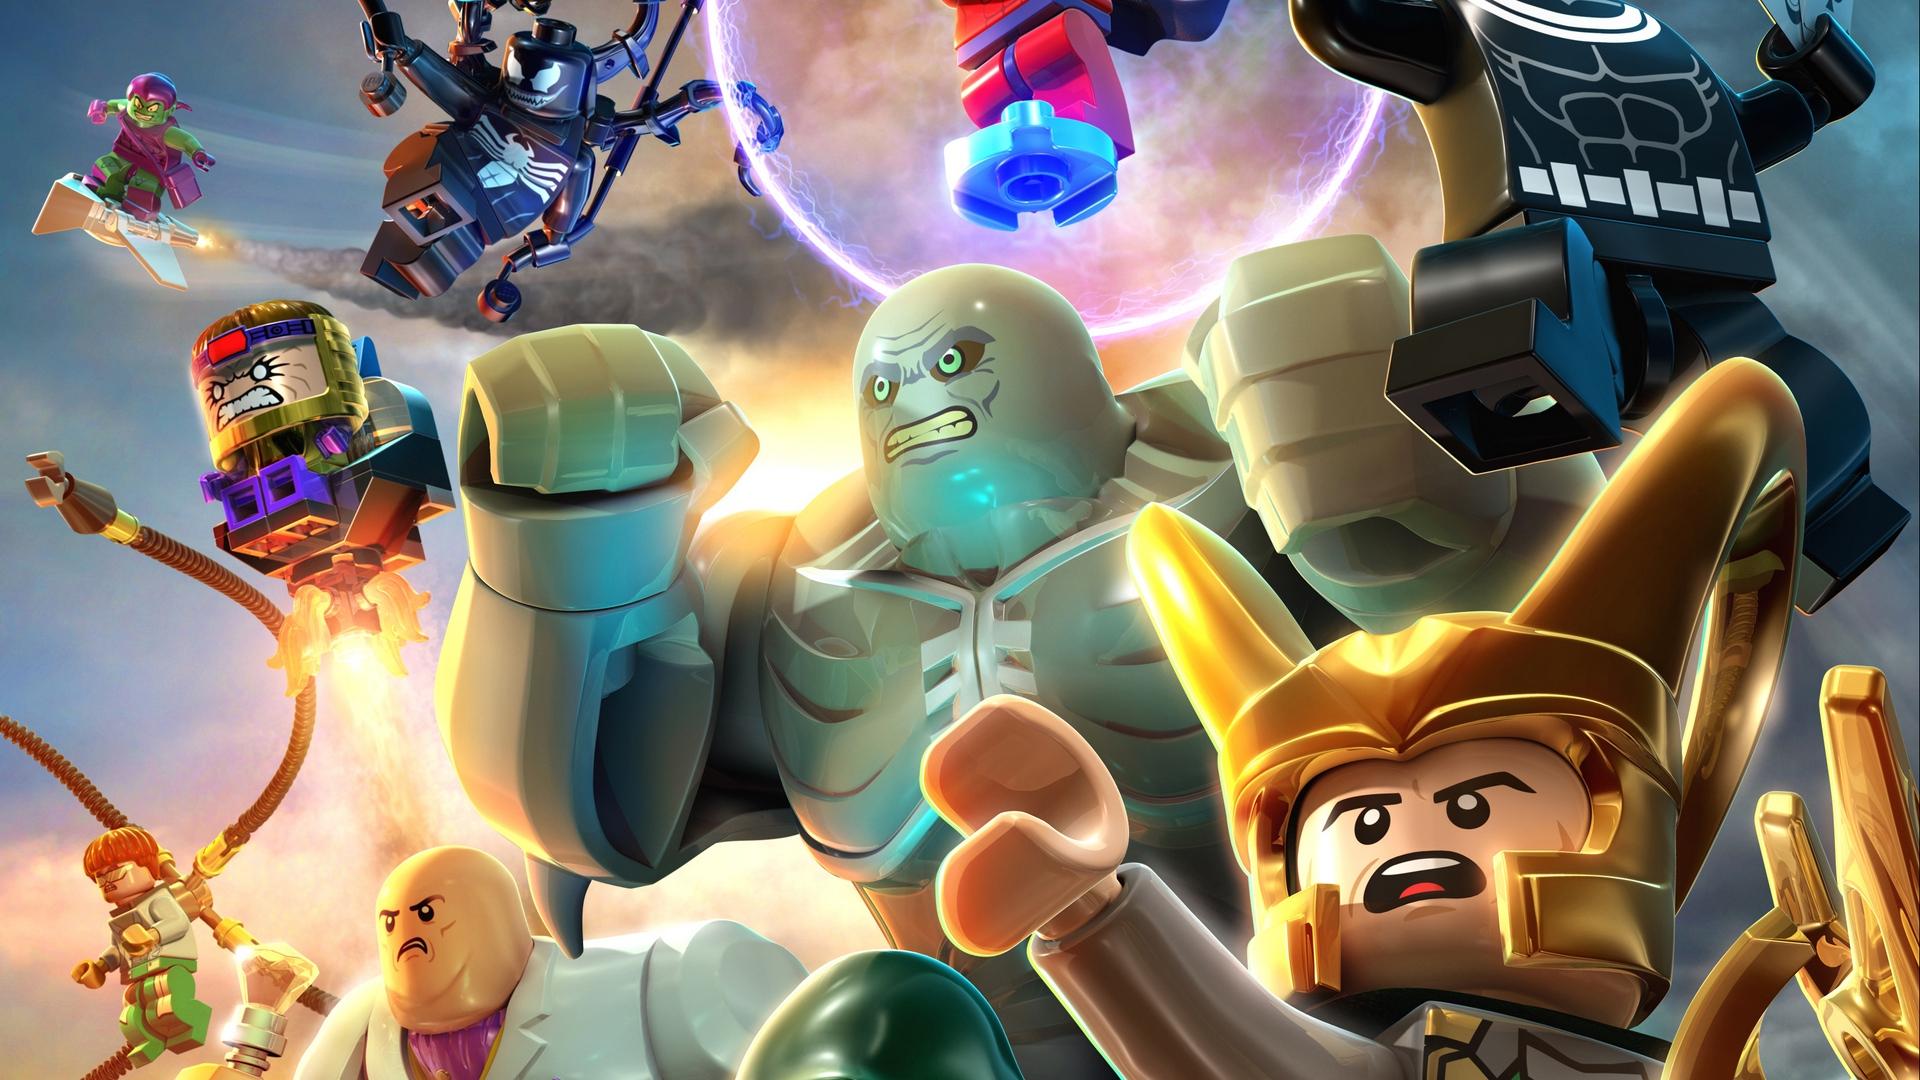 download wallpaper: LEGO Marvel superschurken wallpaper